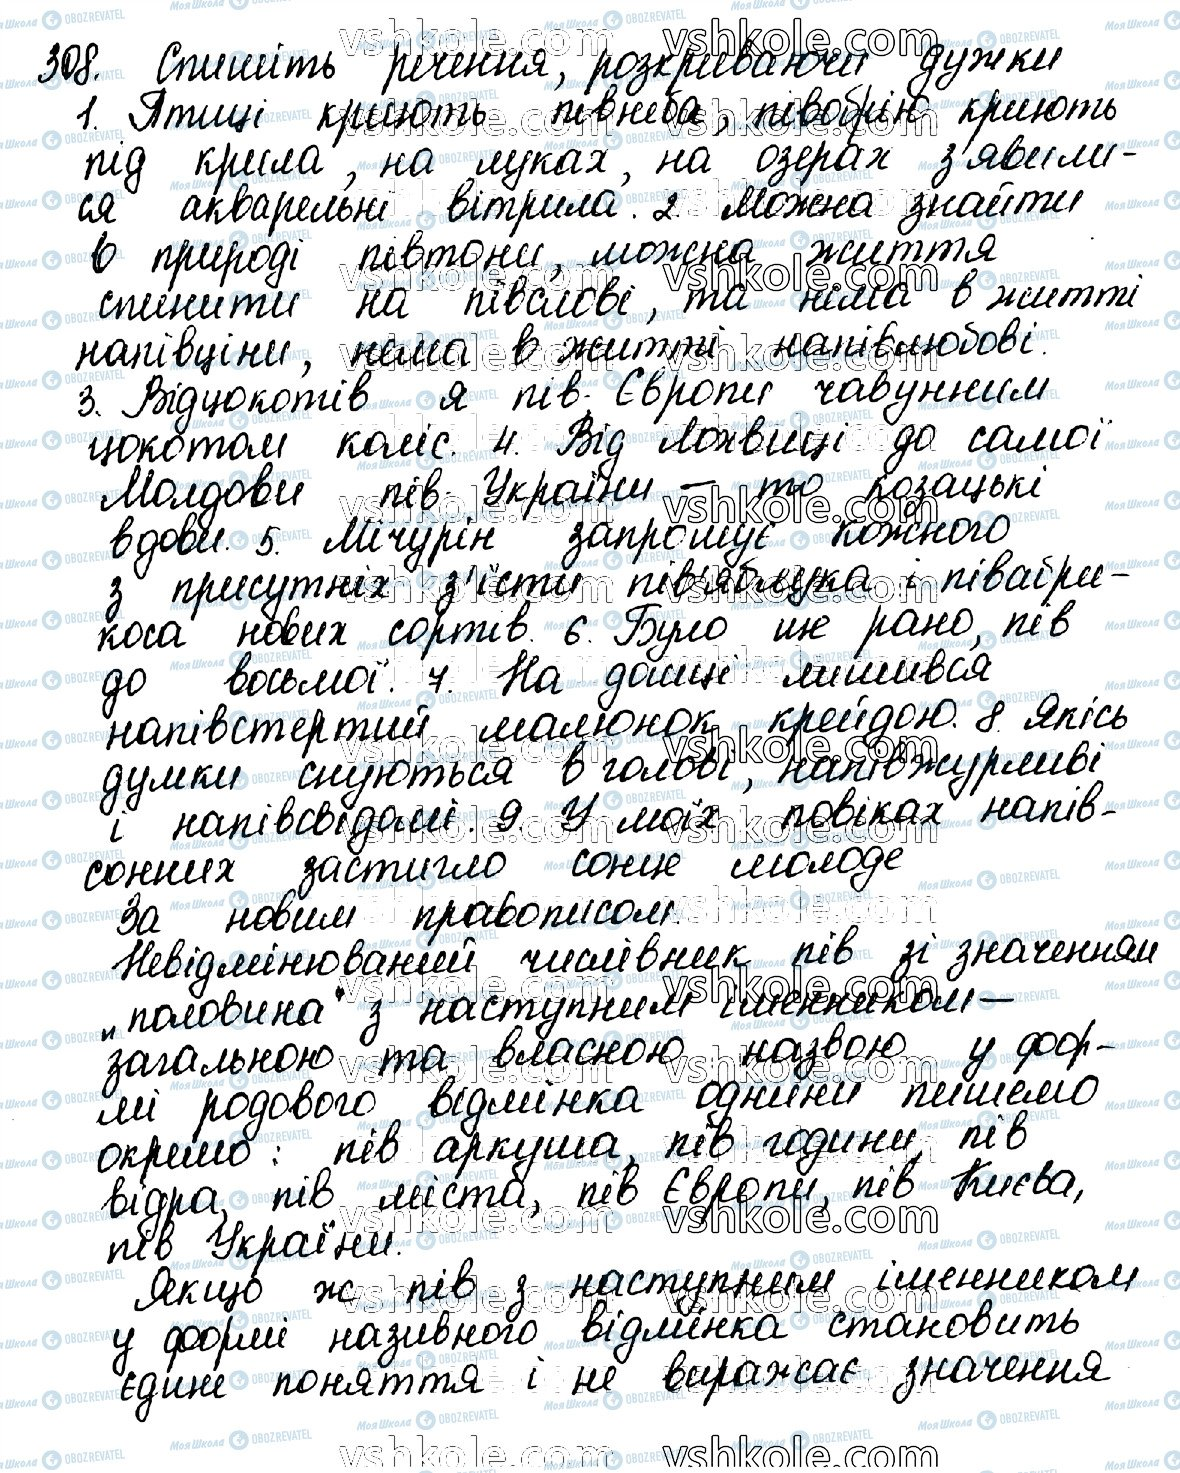 ГДЗ Укр мова 10 класс страница 308